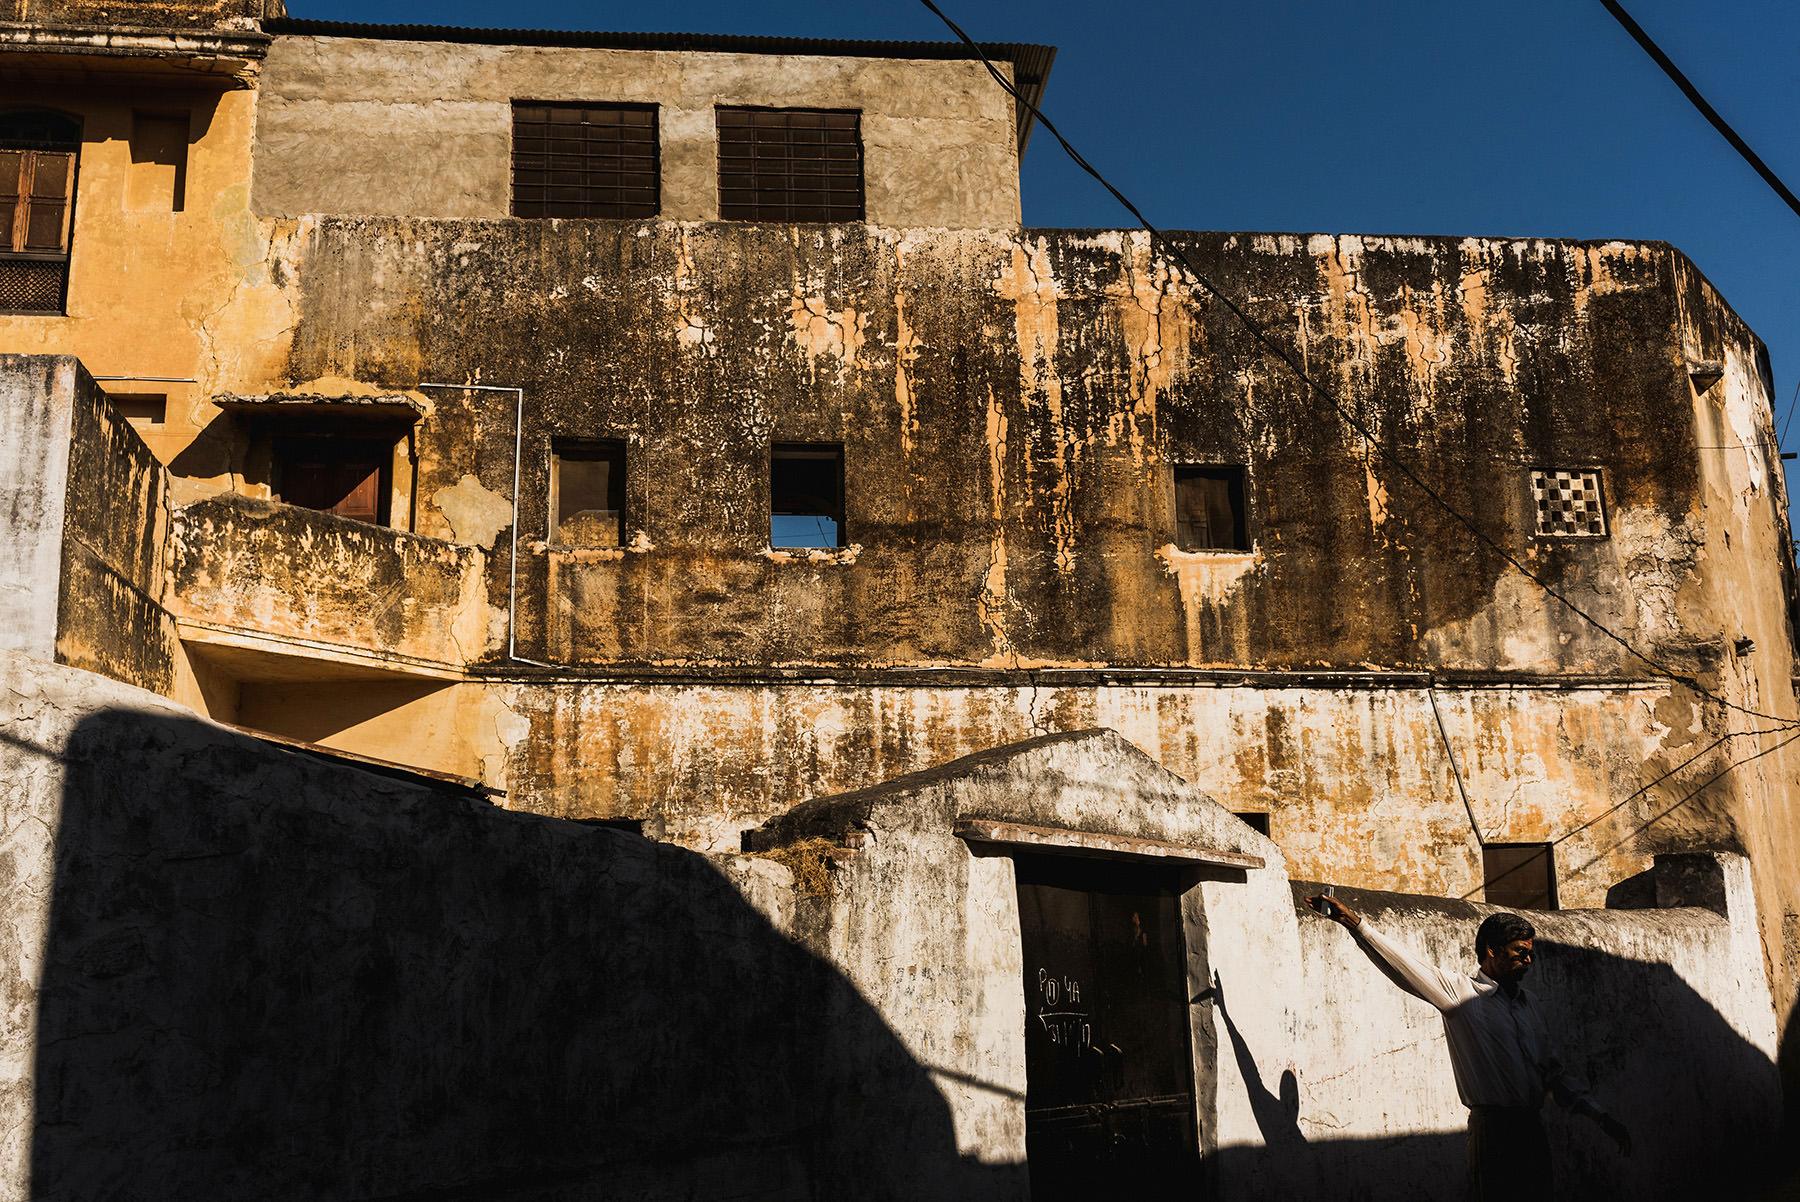 IndiaStreetPhotography